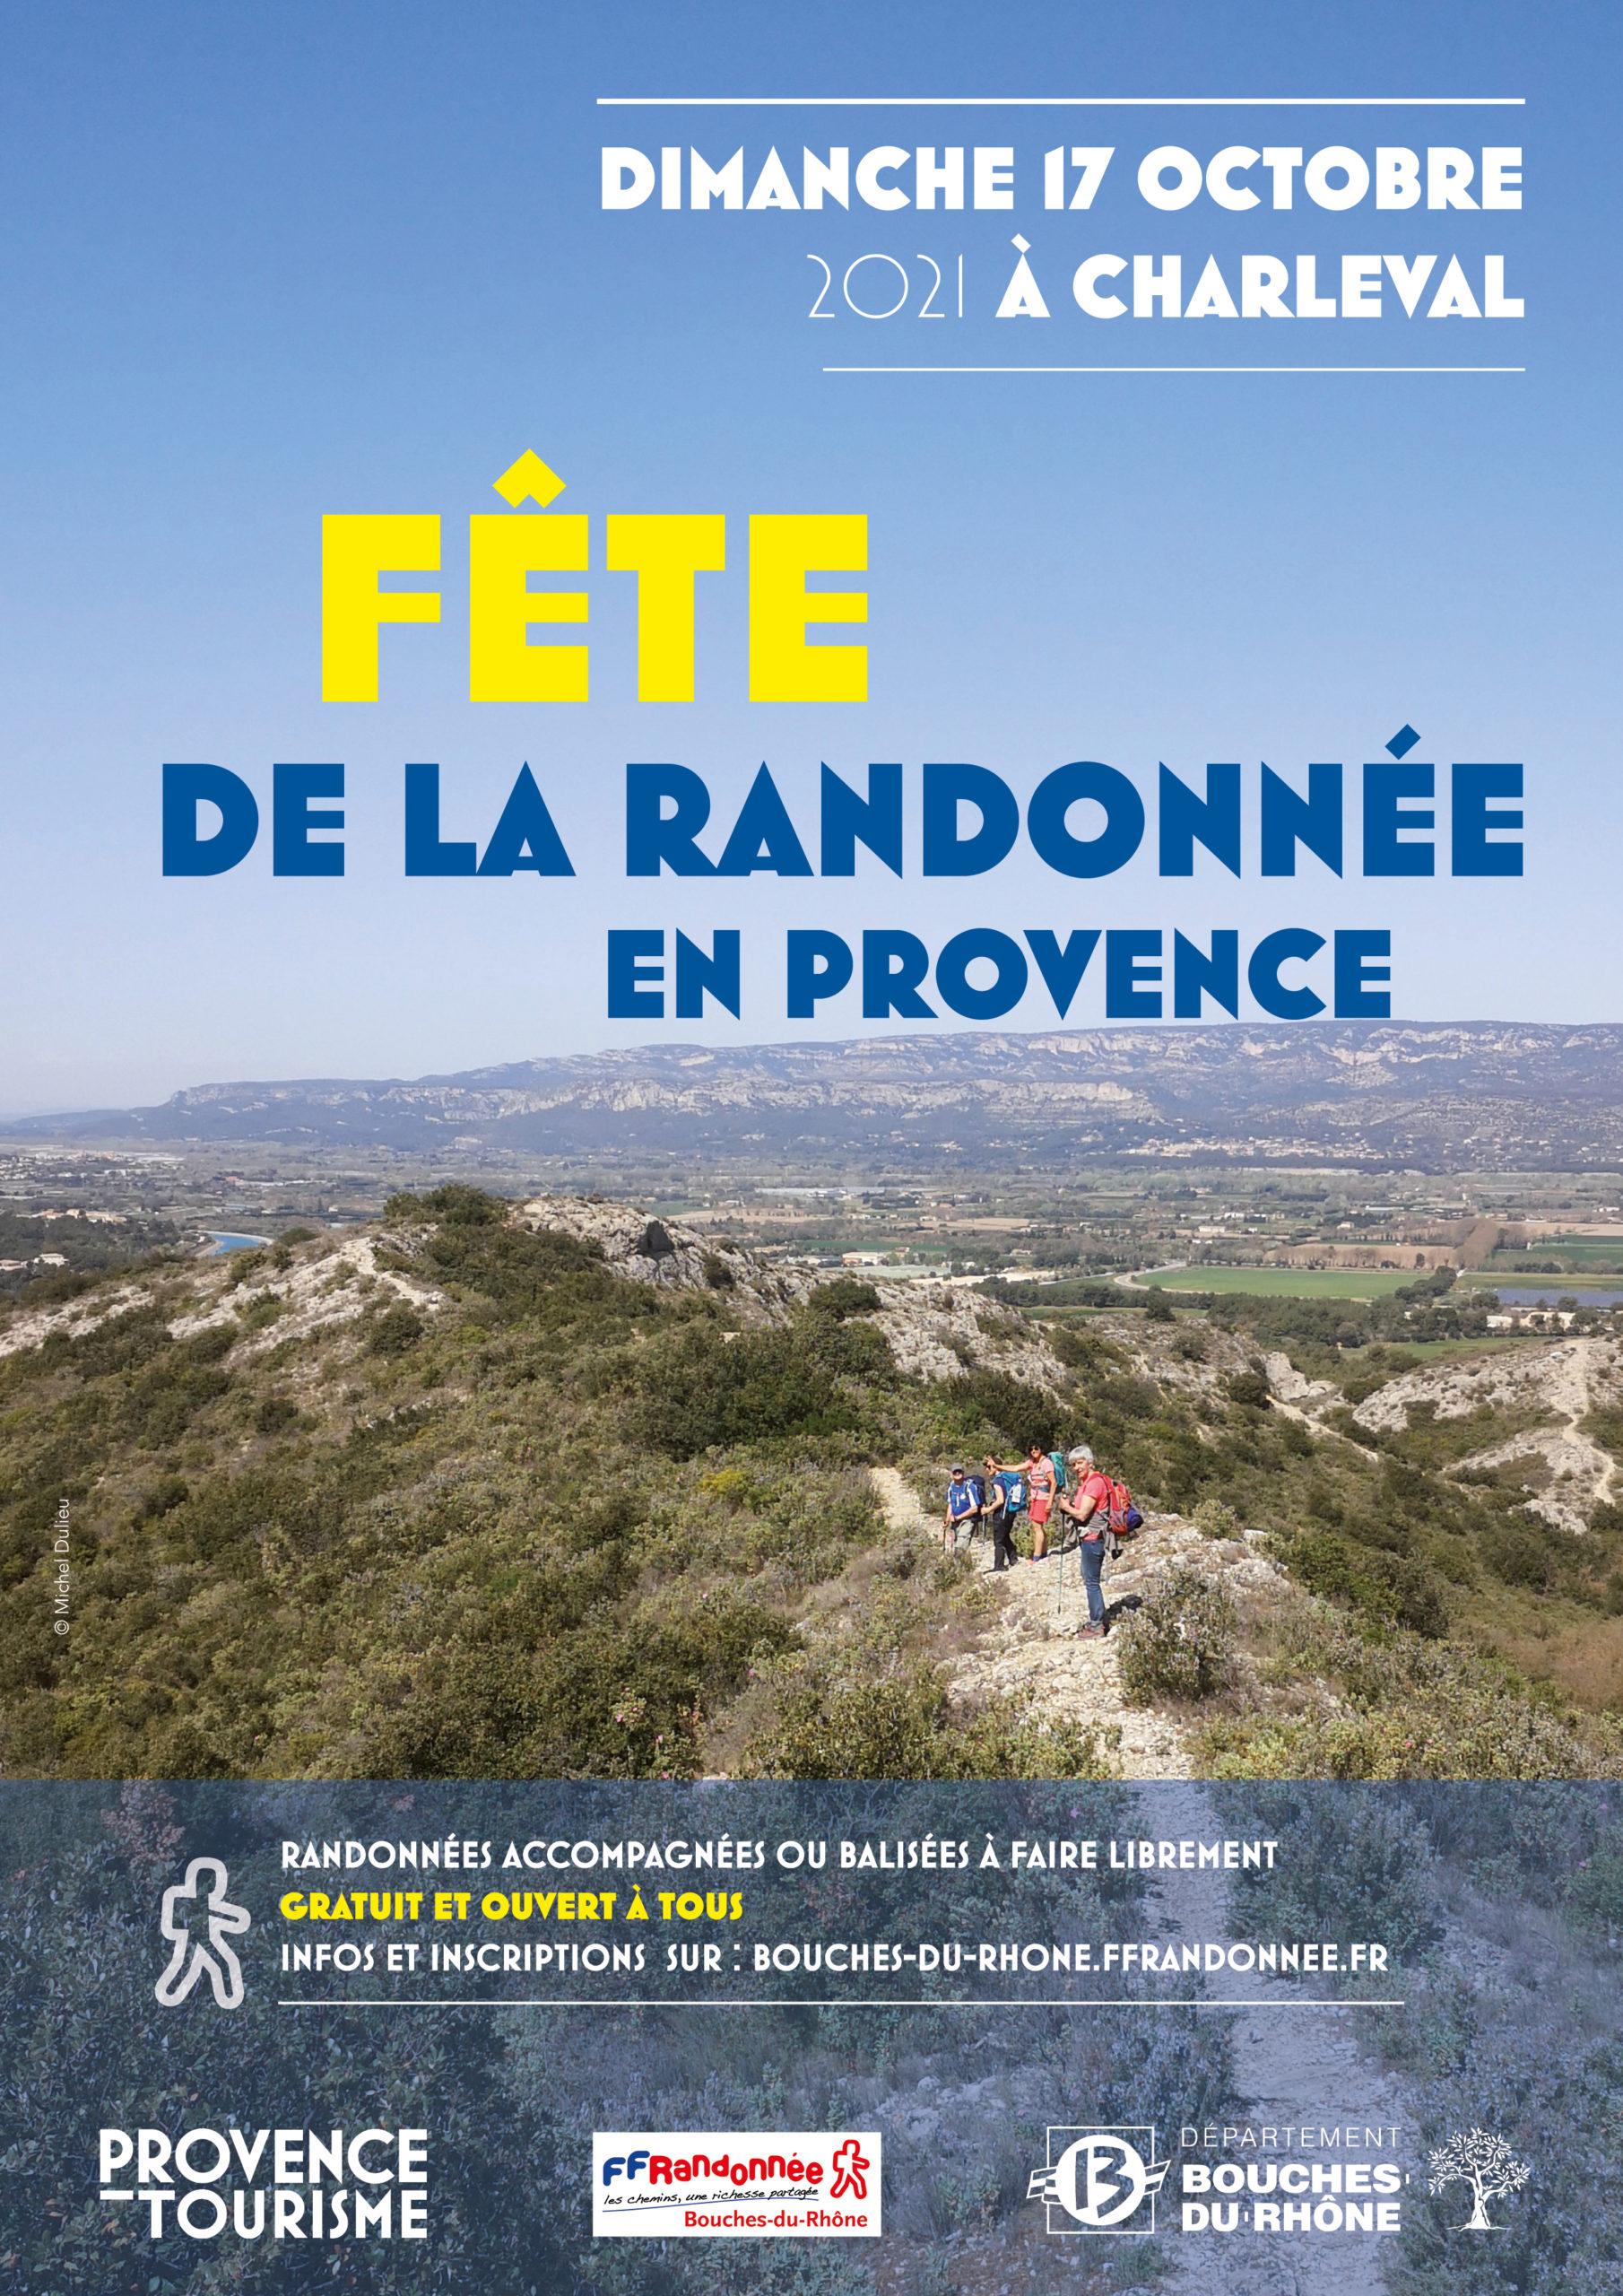 FETE DE LA RANDONEE LE 17 OCTOBRE A CHARLEVAL